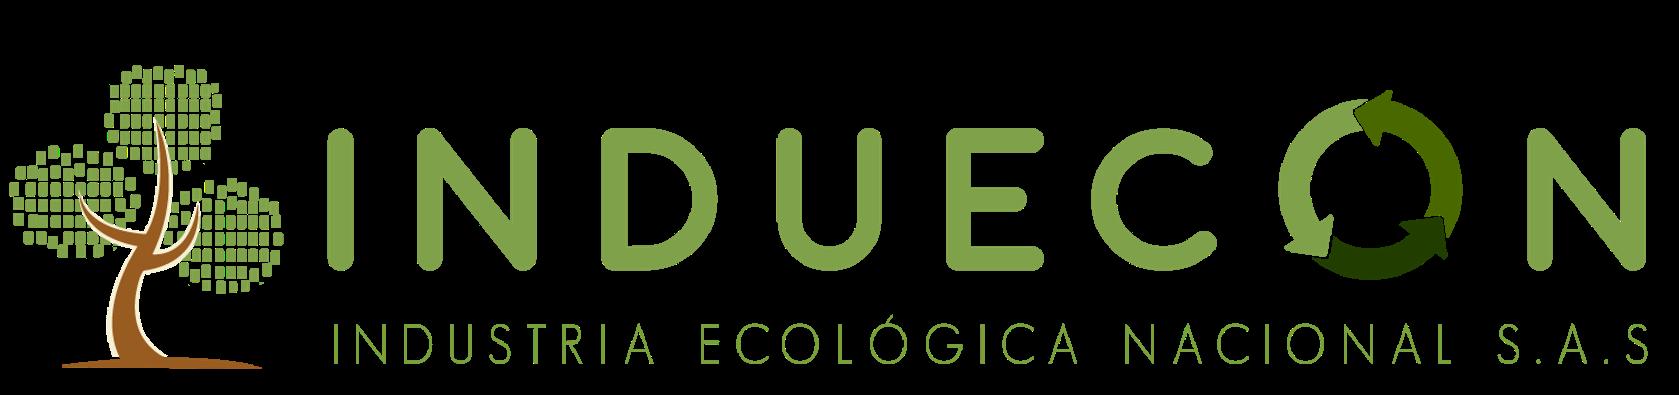 Industria Ecológica Nacional S.A.S